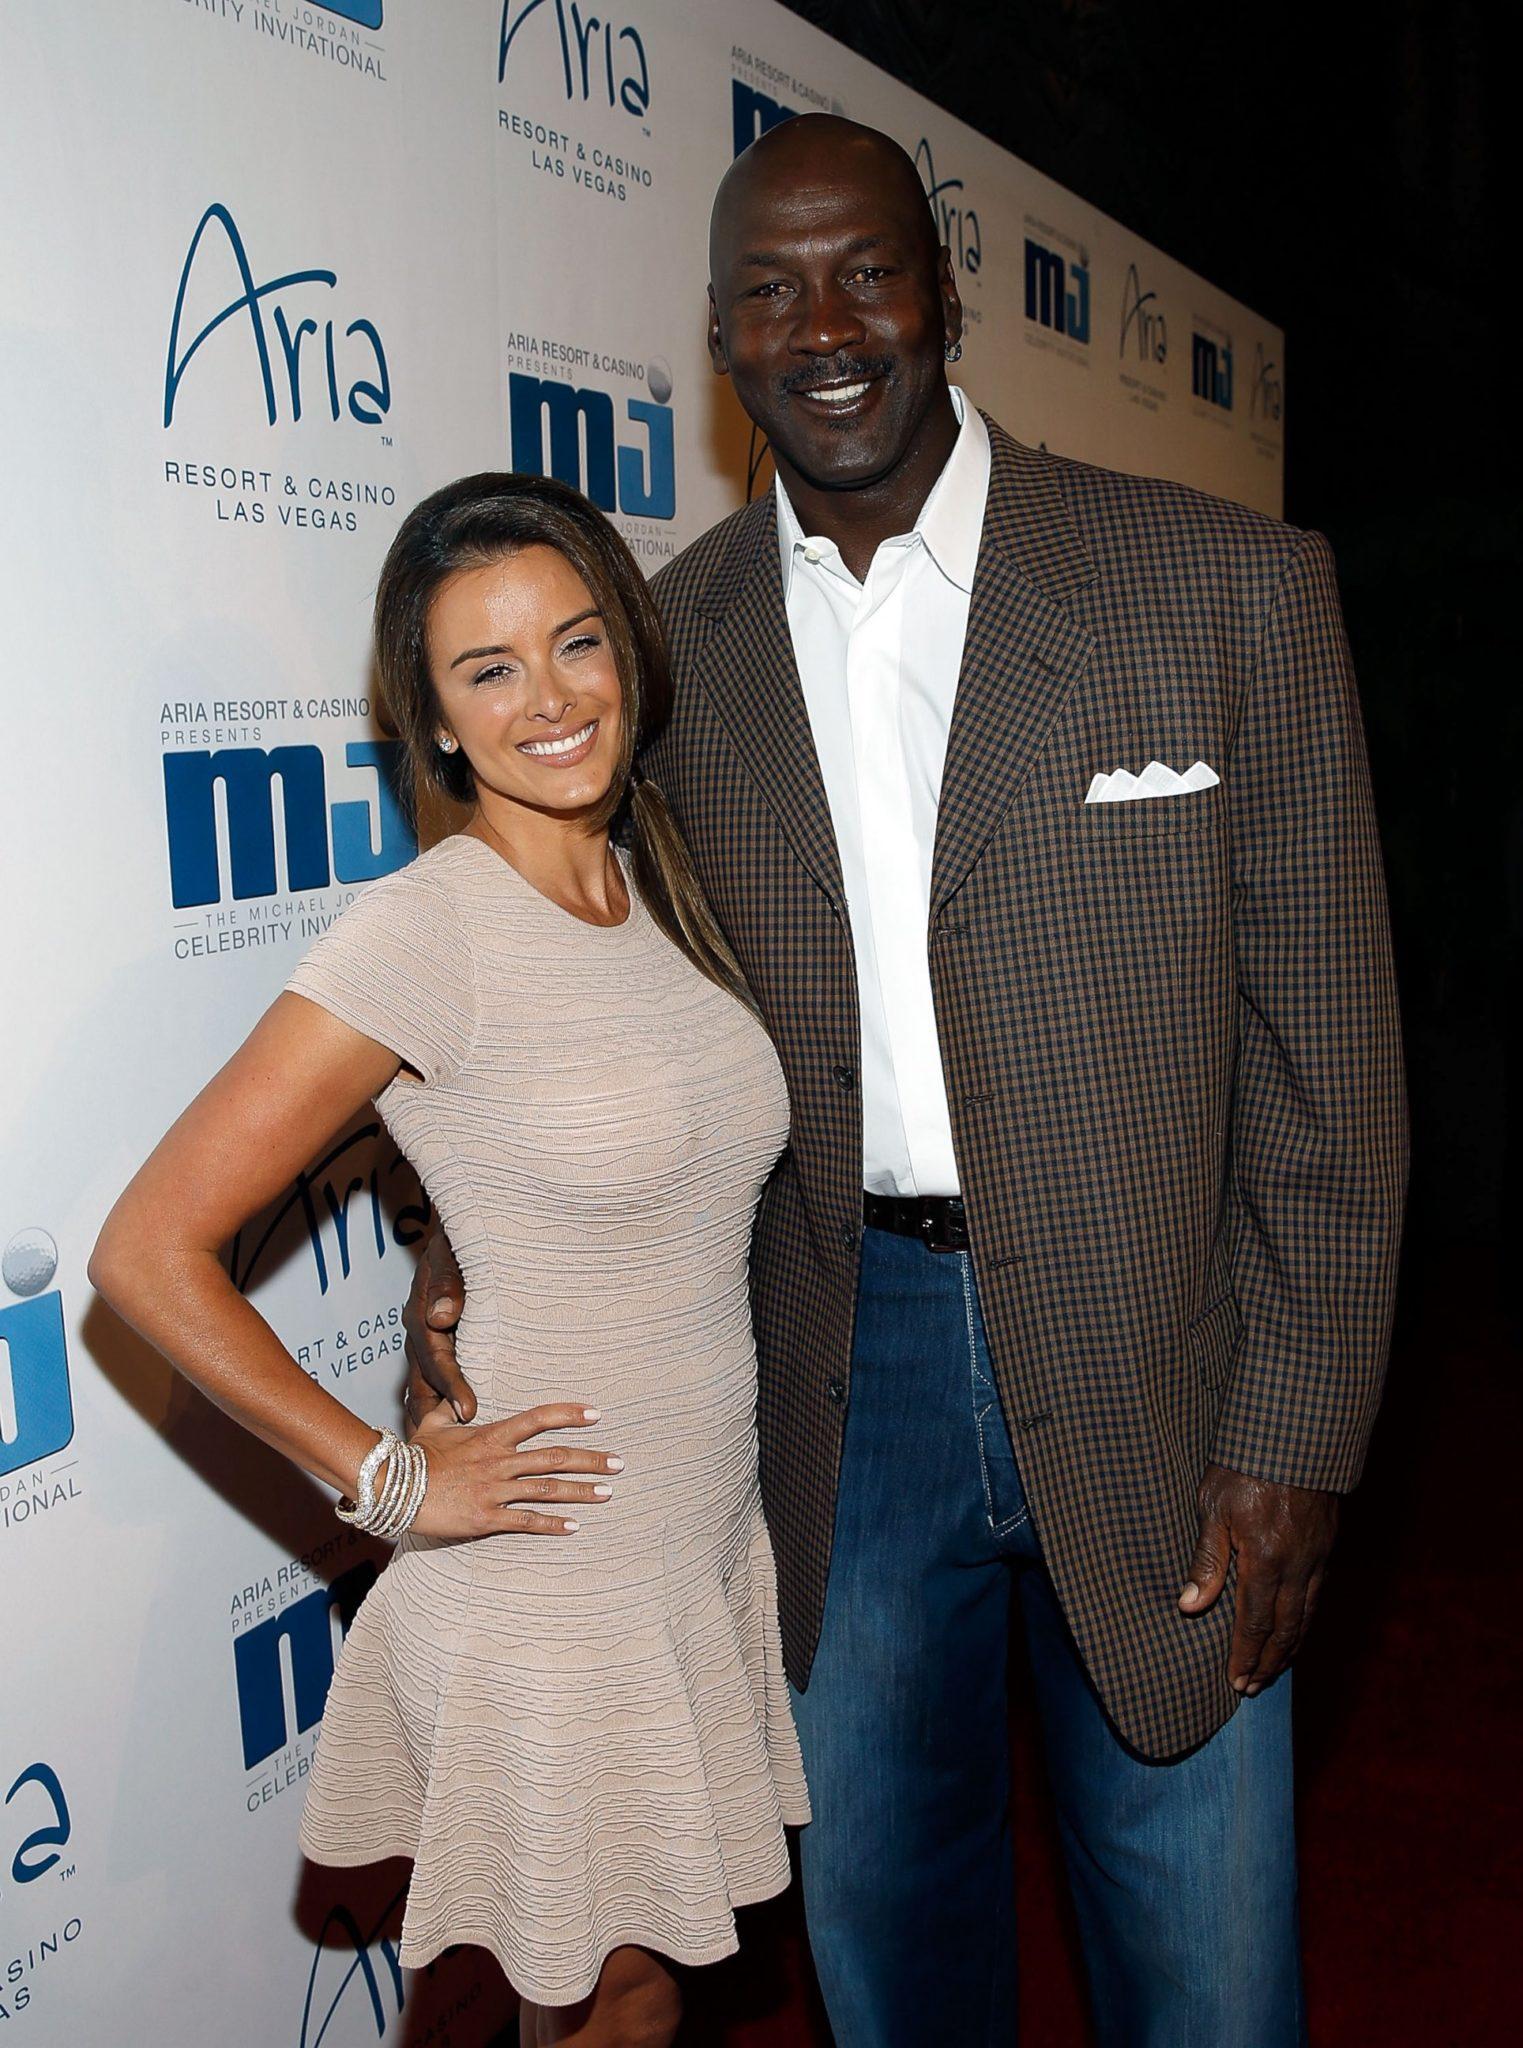 Michael Jordans Wife-Yvette Jordan: Bio, Net Worth, Kids